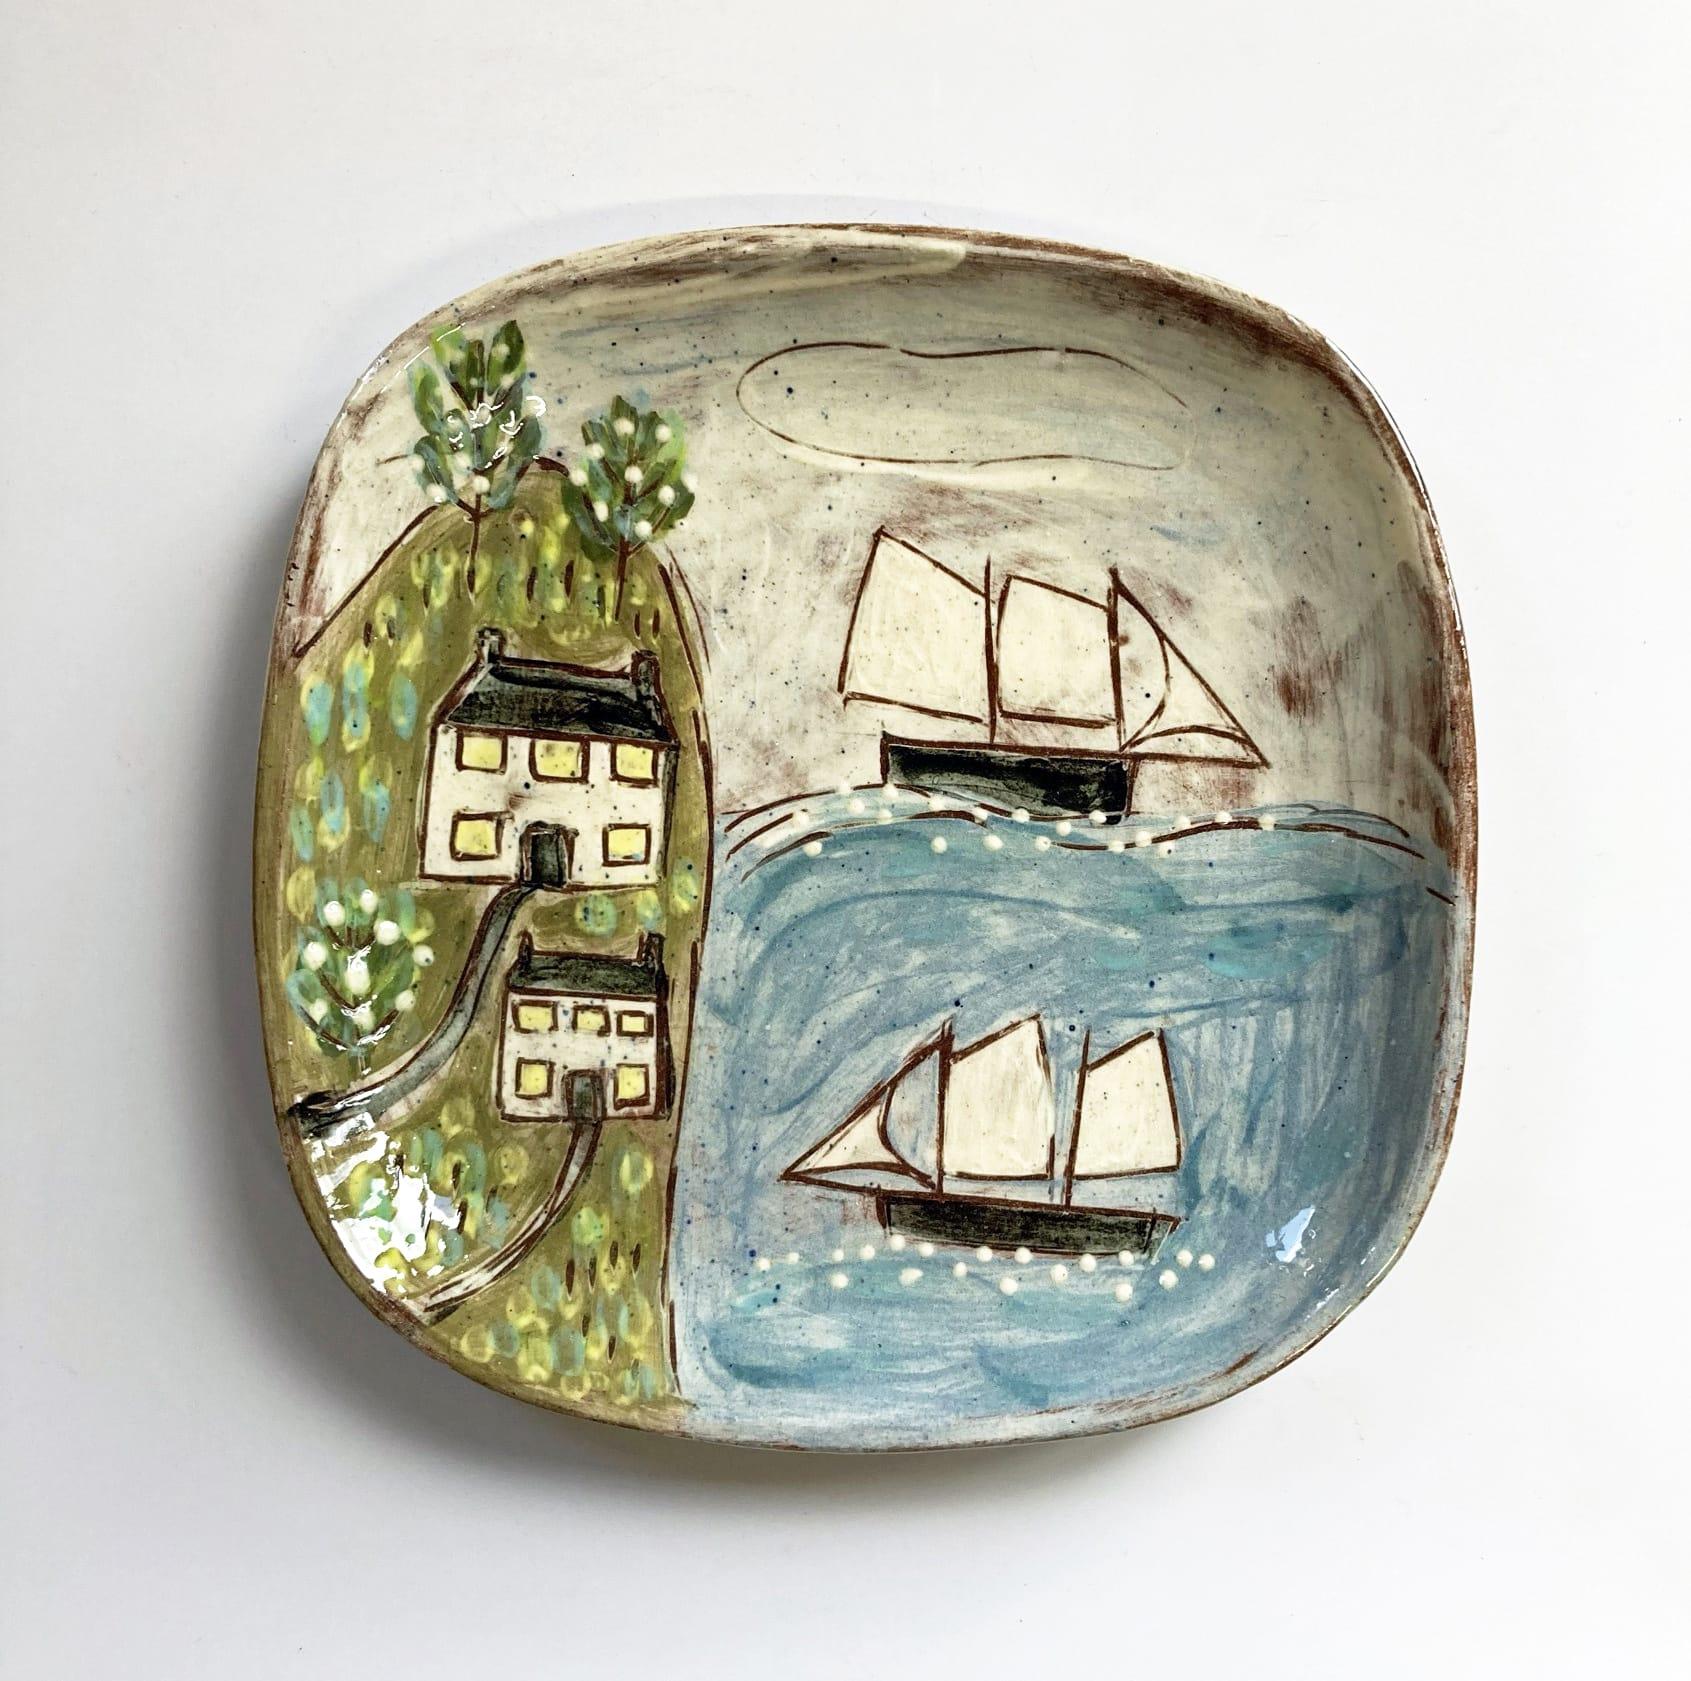 "<span class=""link fancybox-details-link""><a href=""/artists/428-anne-barrell/works/7635-anne-barrell-off-shore-2021/"">View Detail Page</a></span><div class=""artist""><strong>Anne Barrell</strong></div> <div class=""title""><em>Off Shore</em>, 2021</div> <div class=""medium"">handmade, handpainted ceramic</div> <div class=""dimensions"">16 x 16 cm</div><div class=""copyright_line"">Ownart: £6.60 x 10 Months, 0% APR</div>"